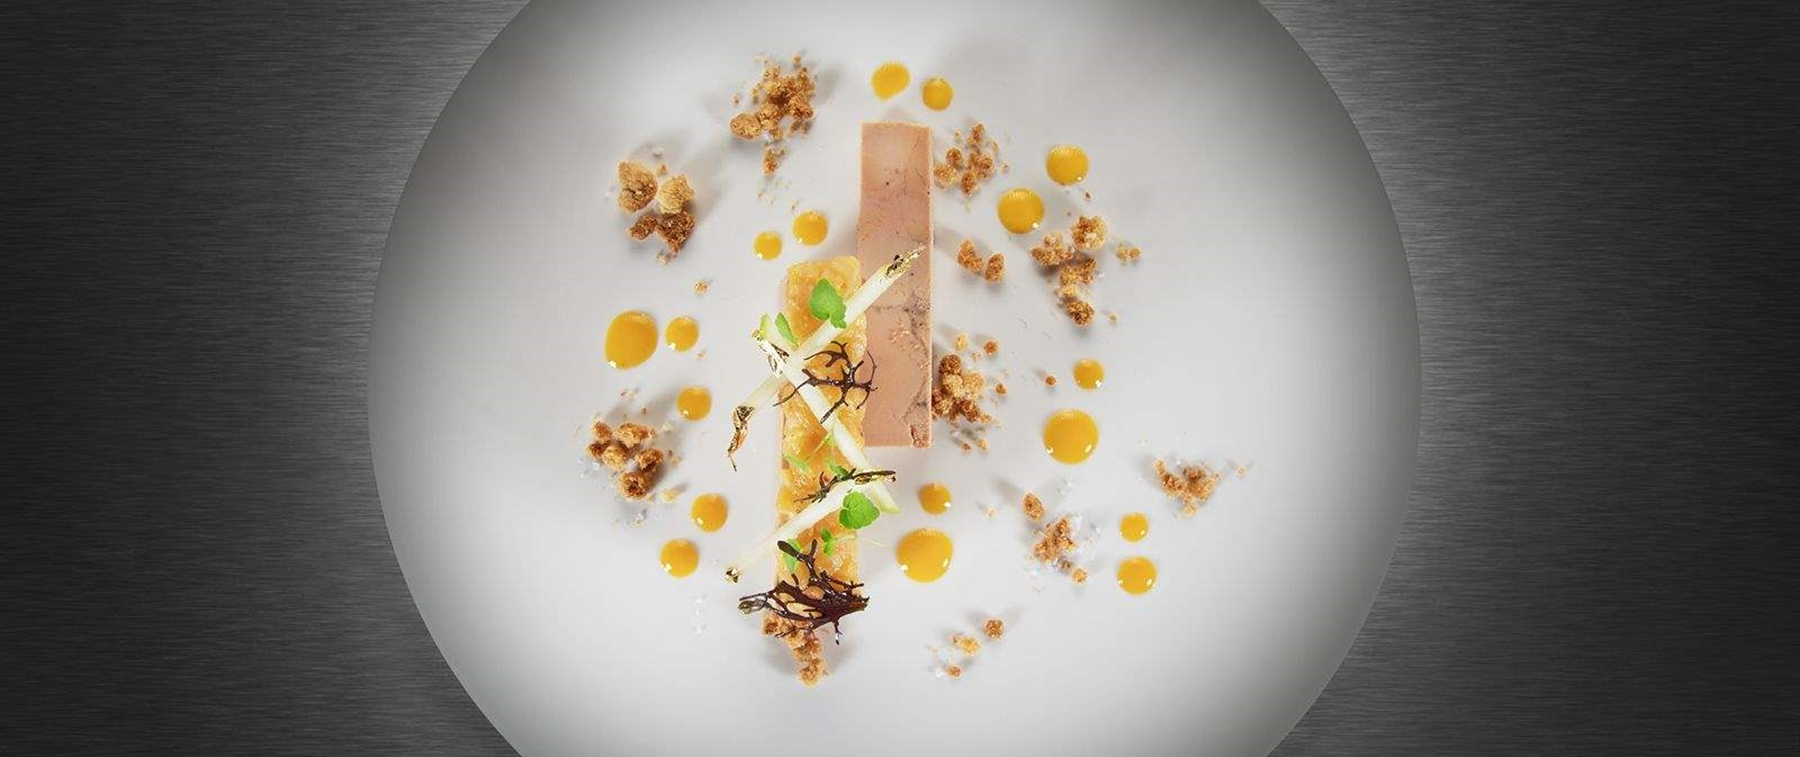 A Michelin starred cuisine